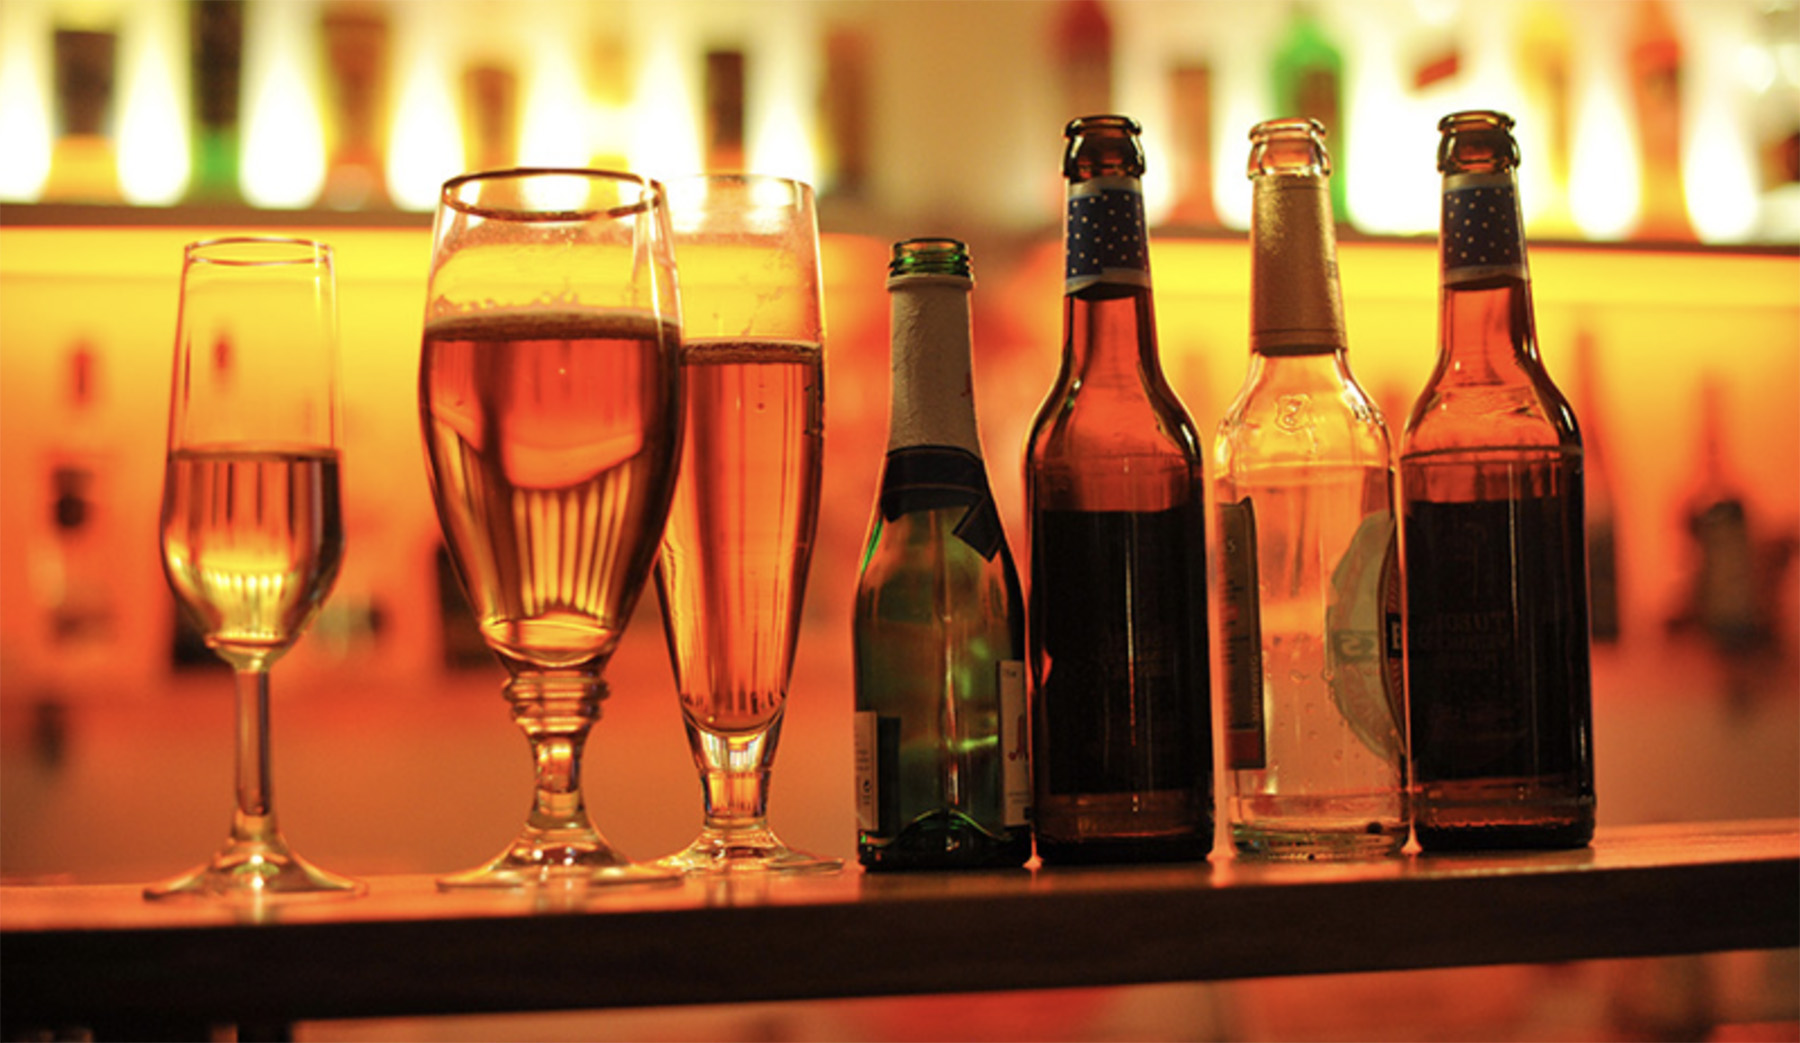 COMBINE study naltrexone acamprosate alcohol abuse